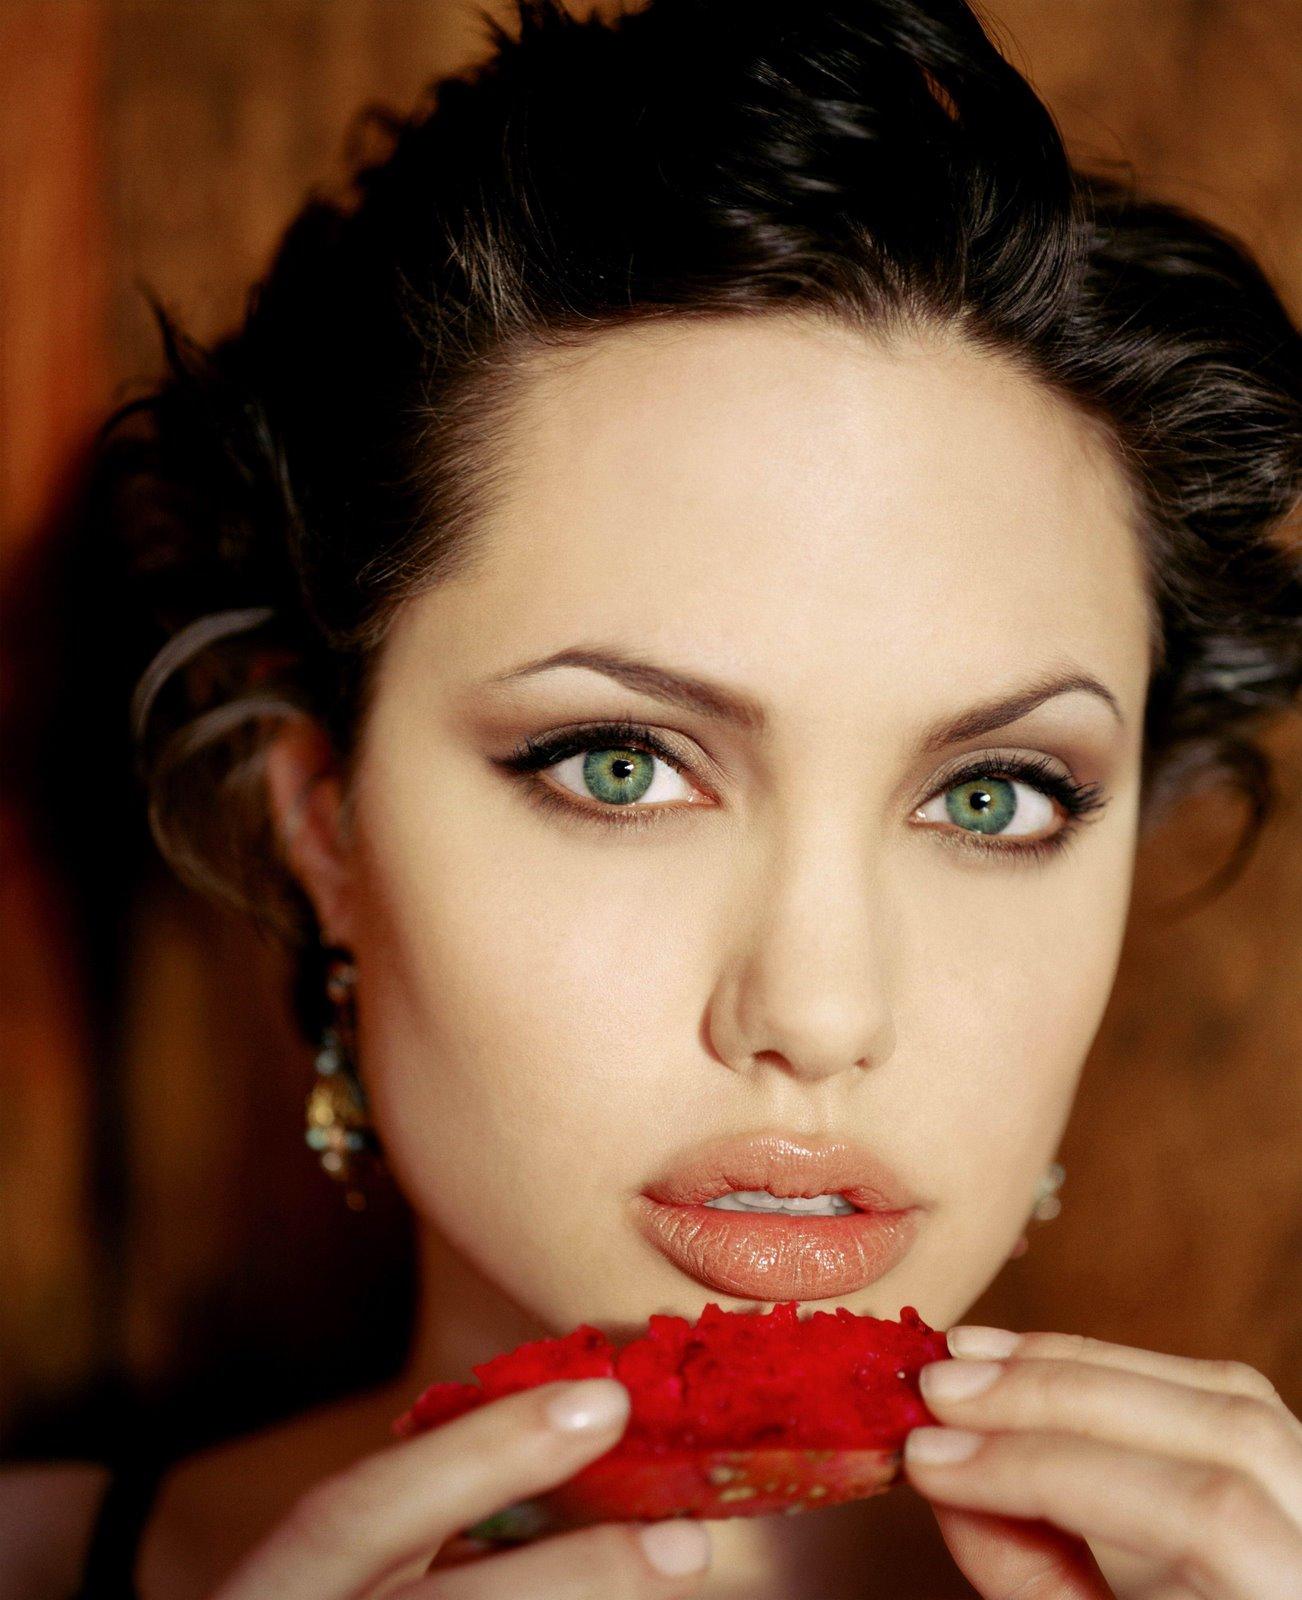 http://1.bp.blogspot.com/-tgsWuLW_n20/TrqOxT_hYWI/AAAAAAAADLc/kyMgUYt3uz4/s1600/short-hair-angelina-jolie-red.jpg